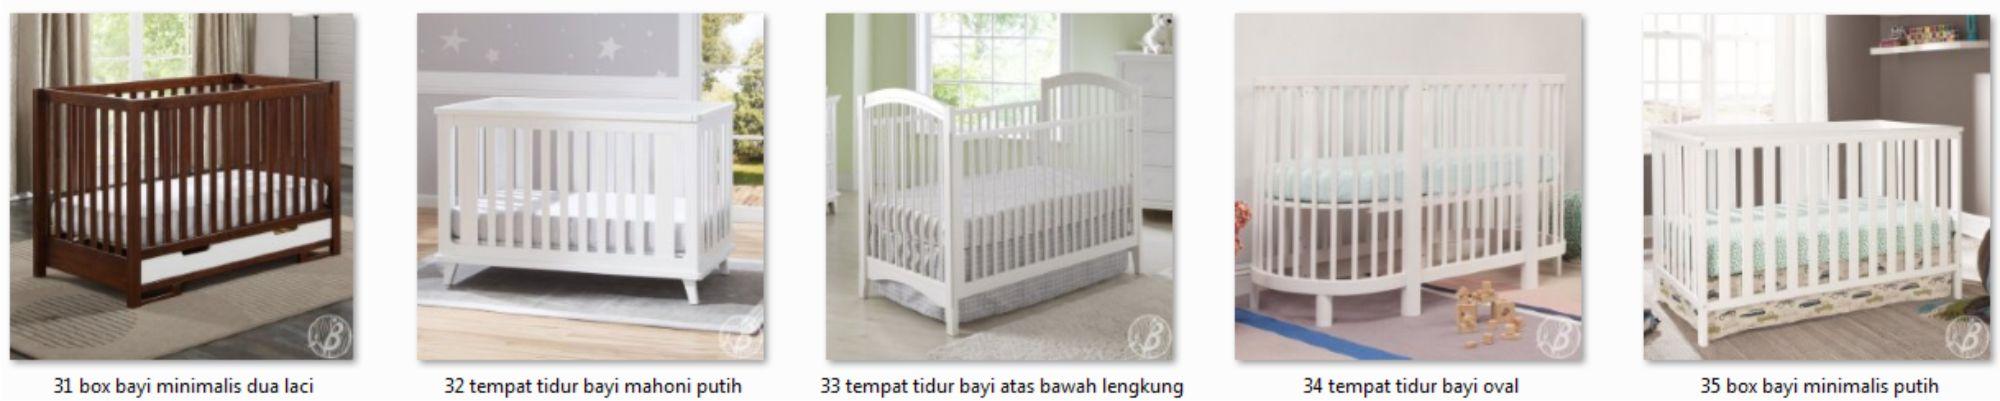 Daftar Harga Box Tempat Tidur Bayi